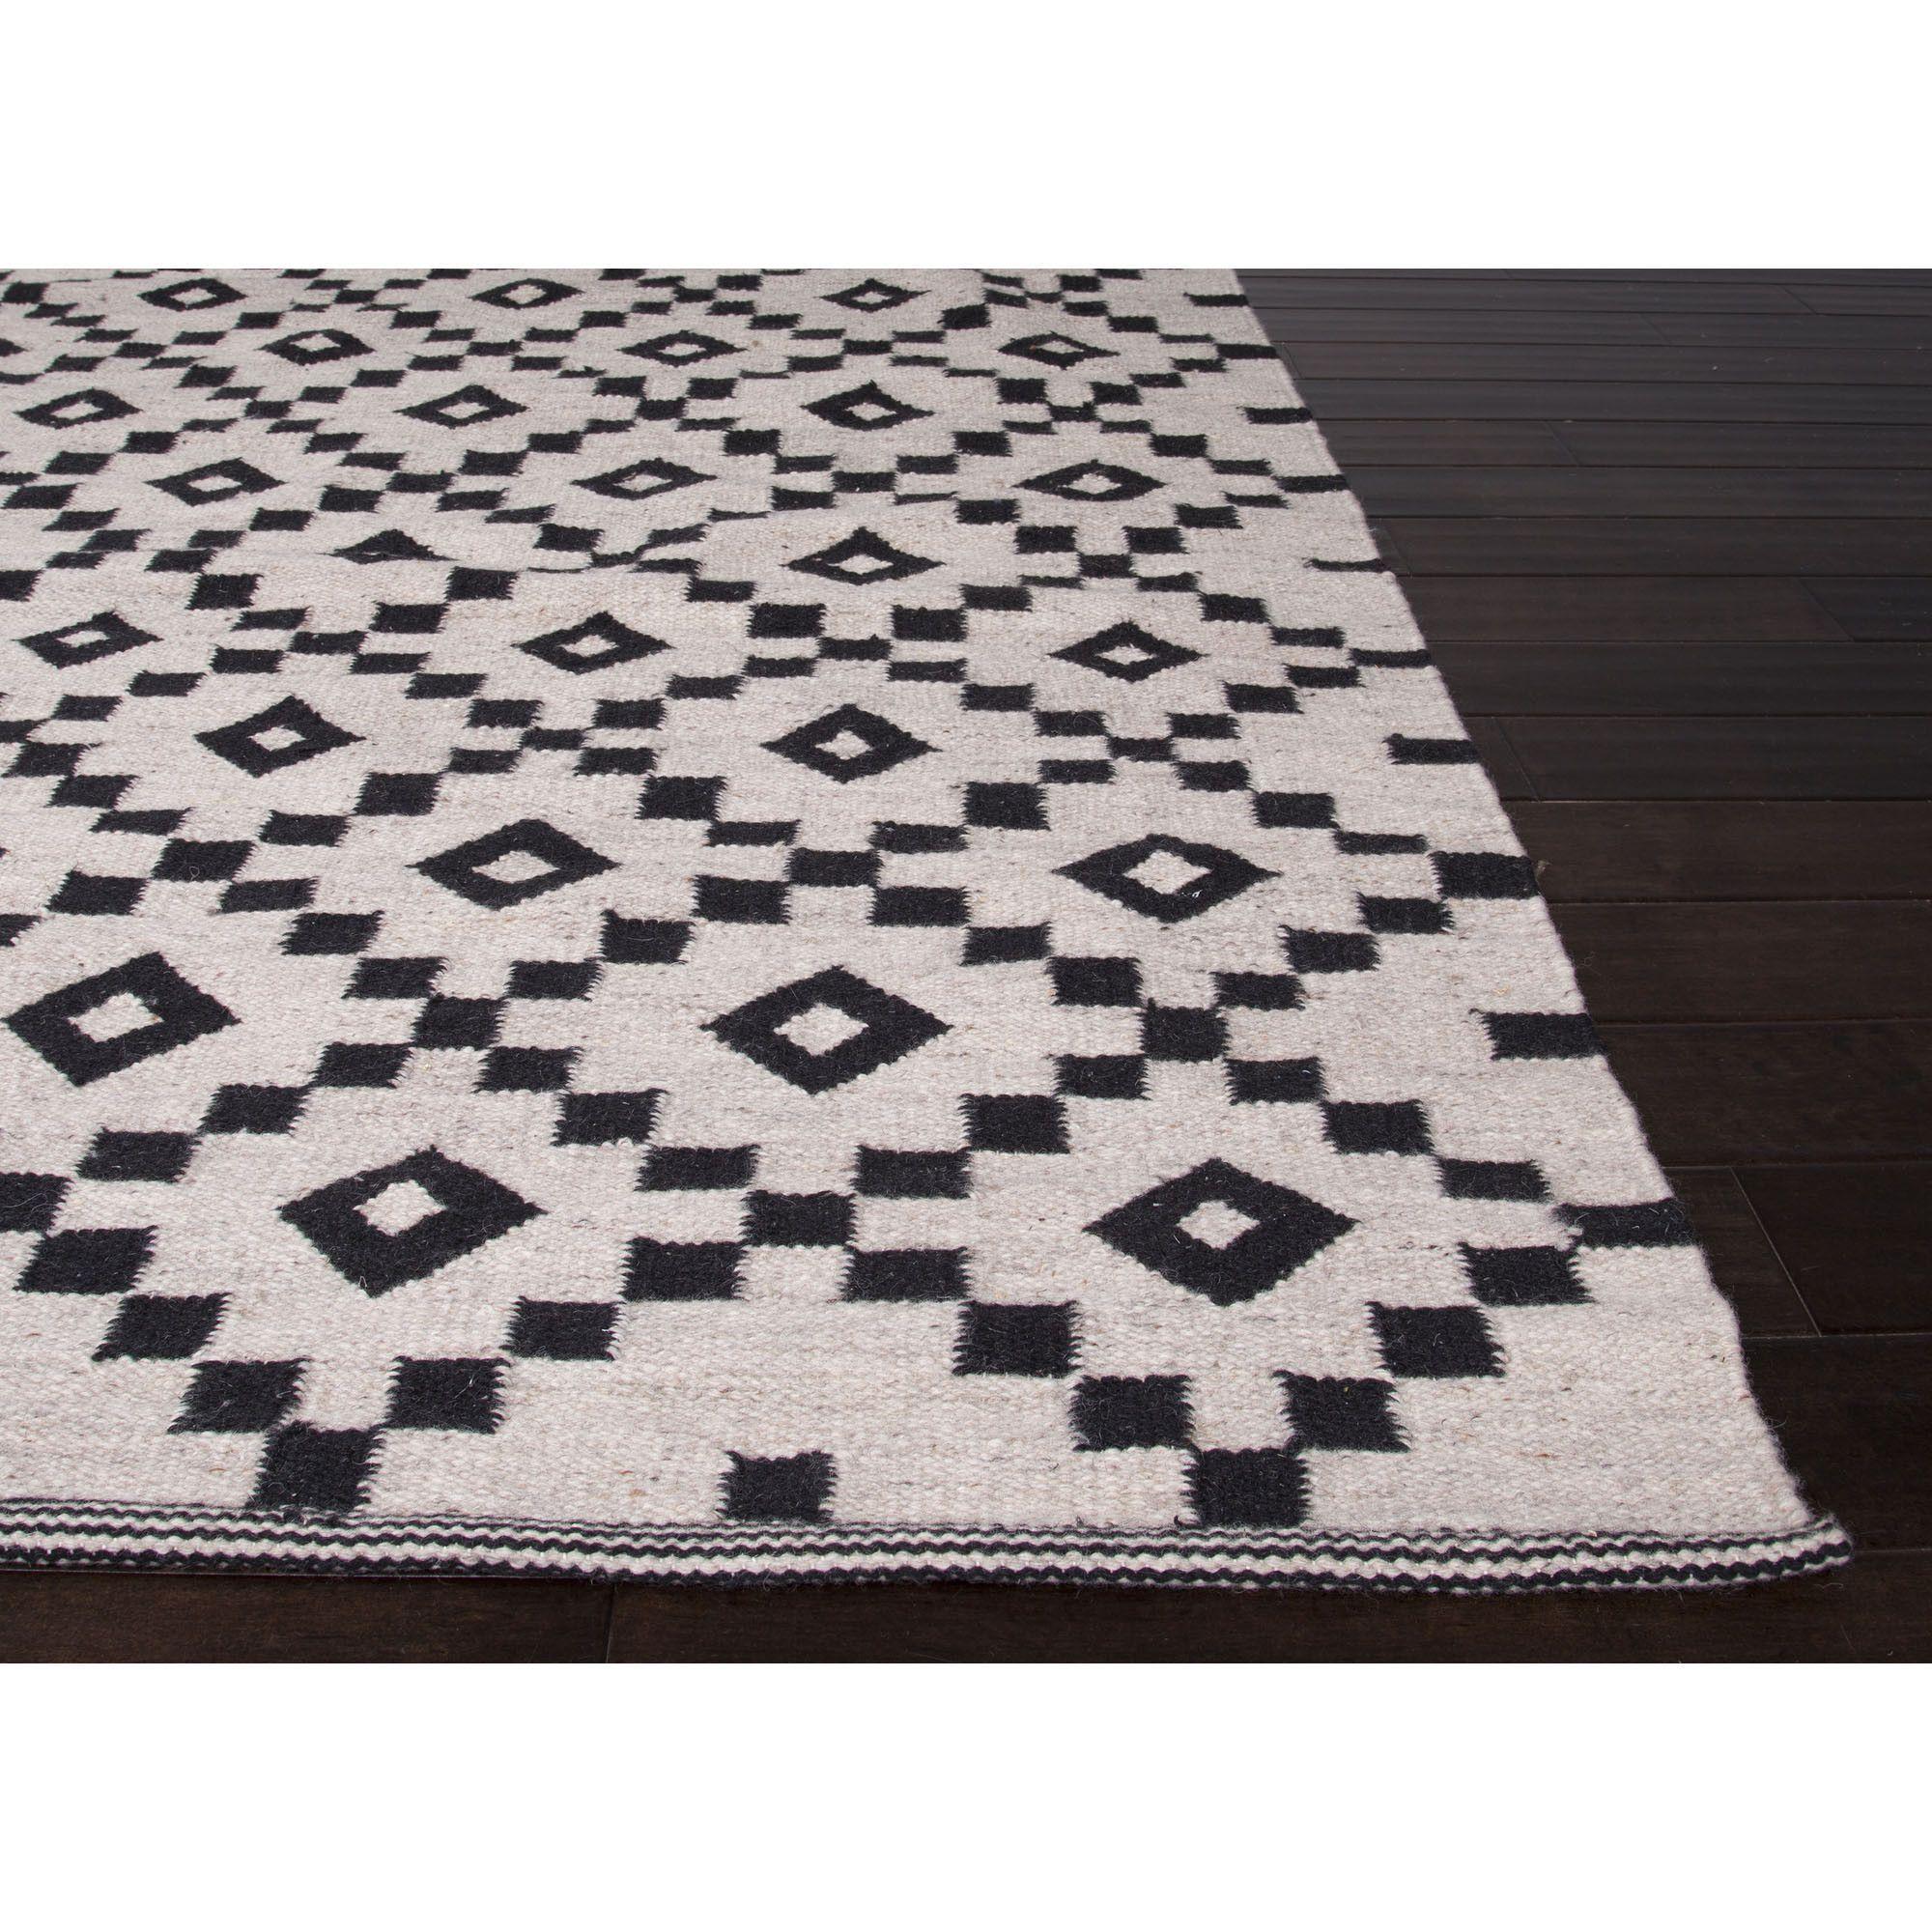 Jaipur Rugs Flatweave Geometric Pattern Ivory Black Wool Area Rug